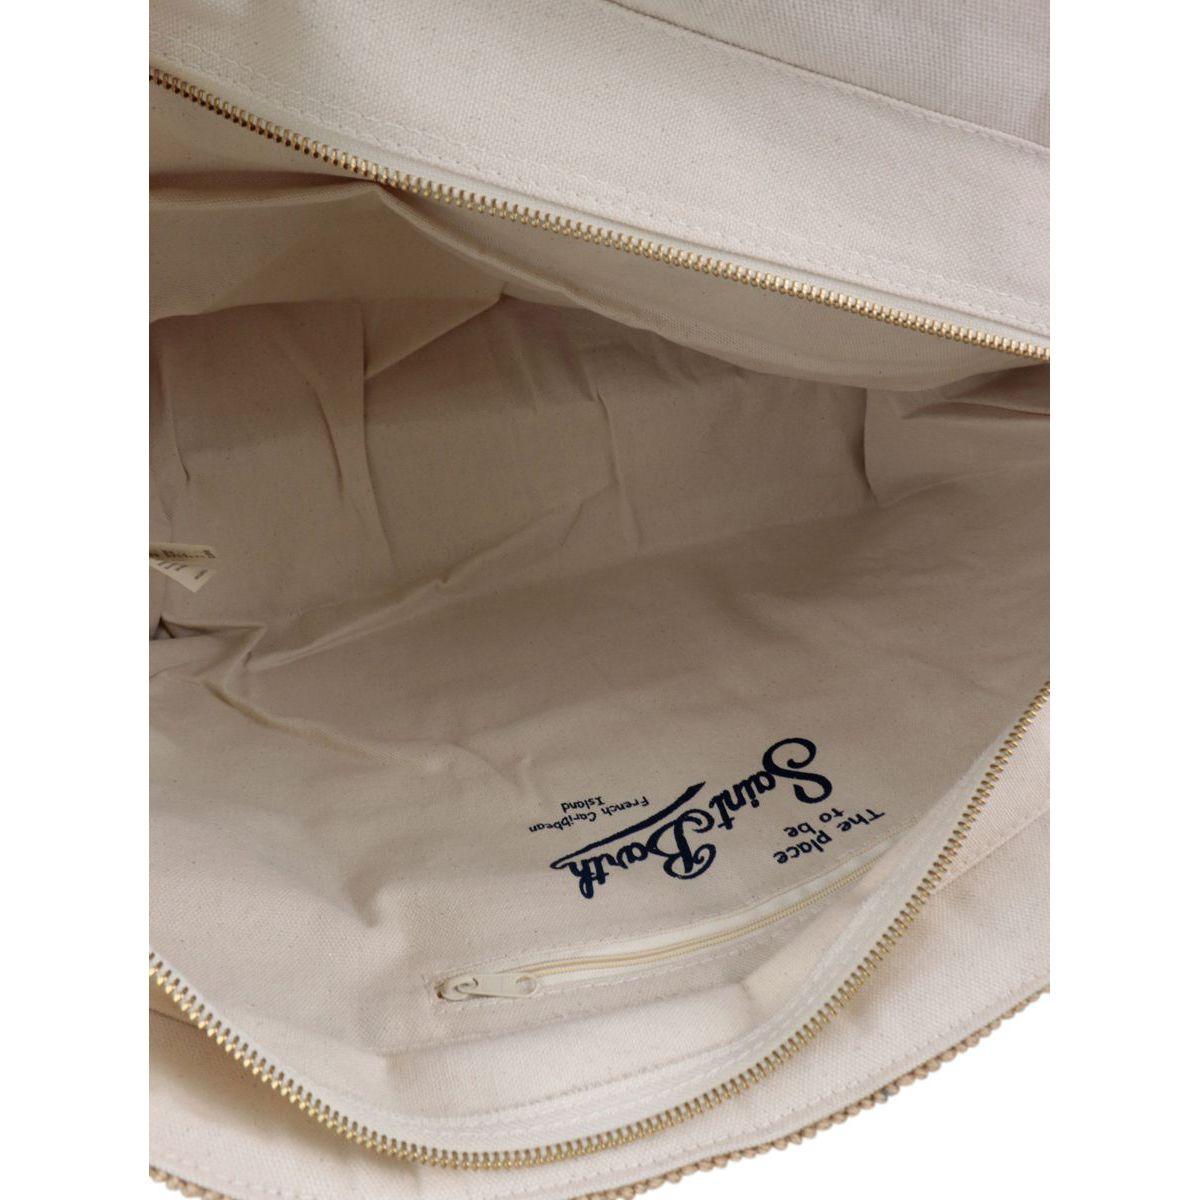 Helene jute bag with leather handles White sand MC2 Saint Barth